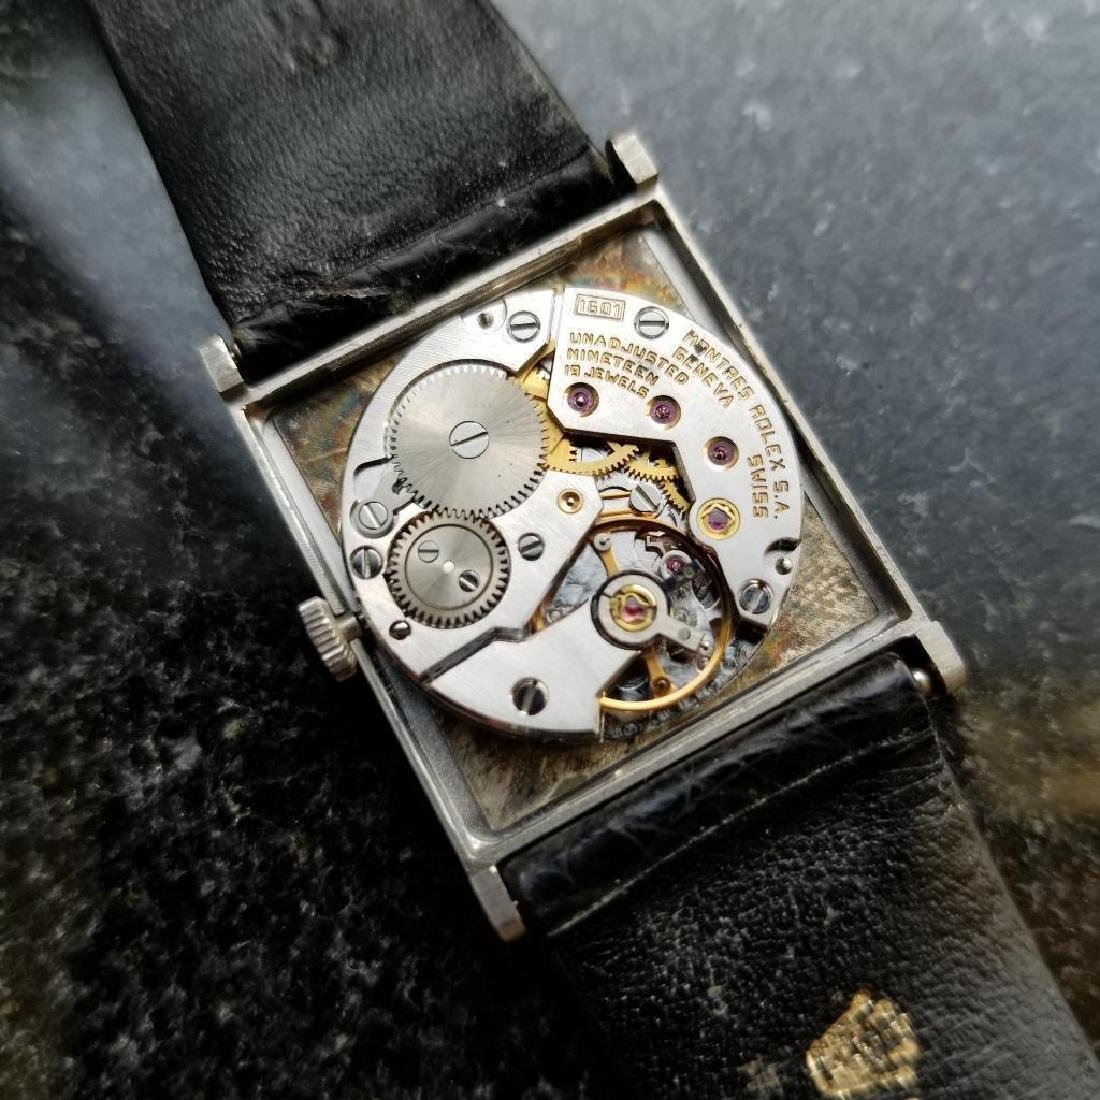 Rolex Vintage Cellini 18K Solid Gold 1975 Swiss Watch - 10